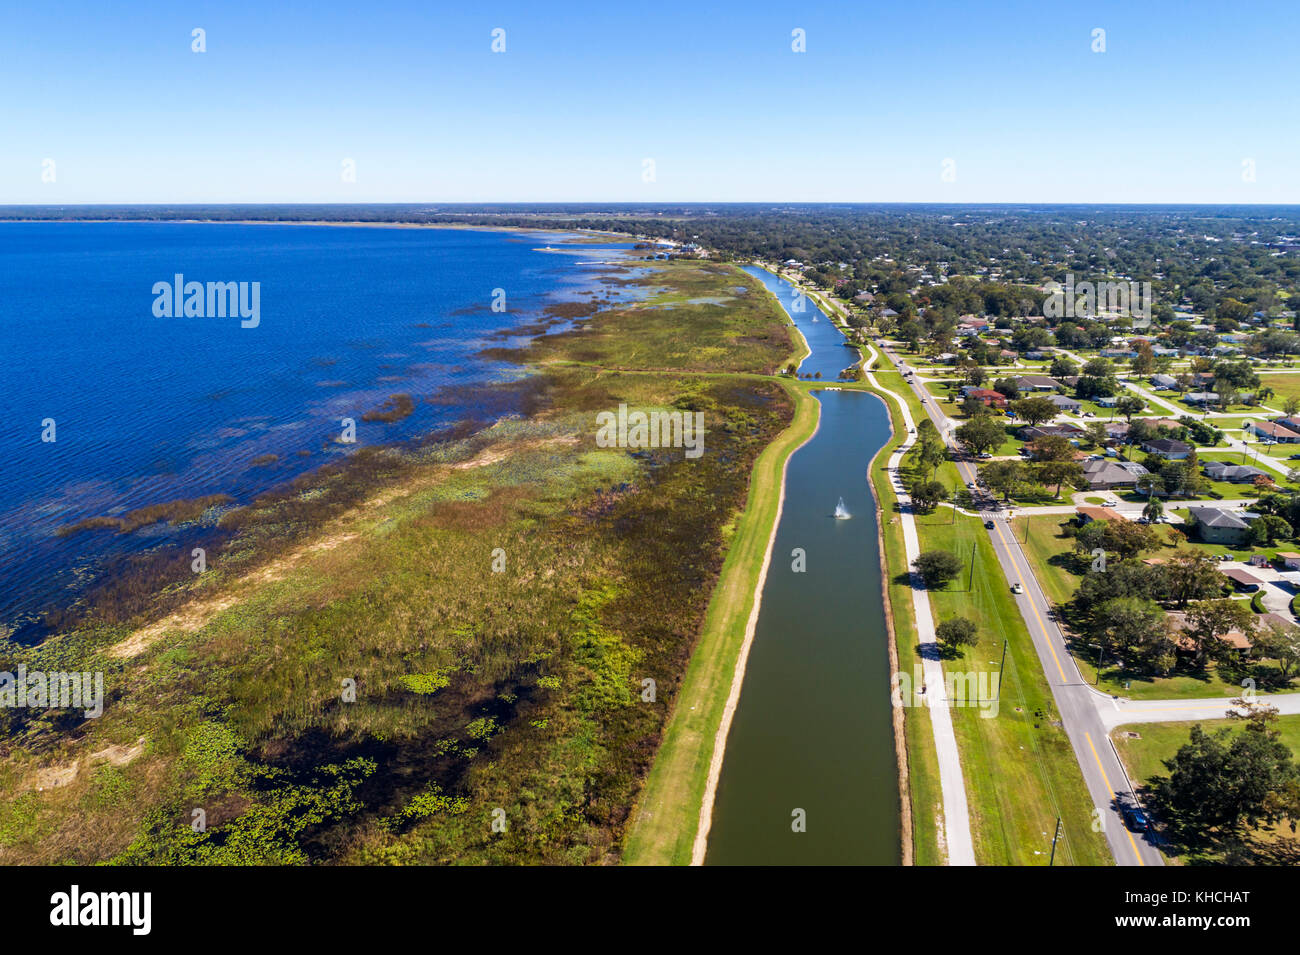 Florida Saint St. Cloud East Lake Tohopekaliga Lakefront Park East Lakeshore Boulevard water aerial overhead bird's - Stock Image